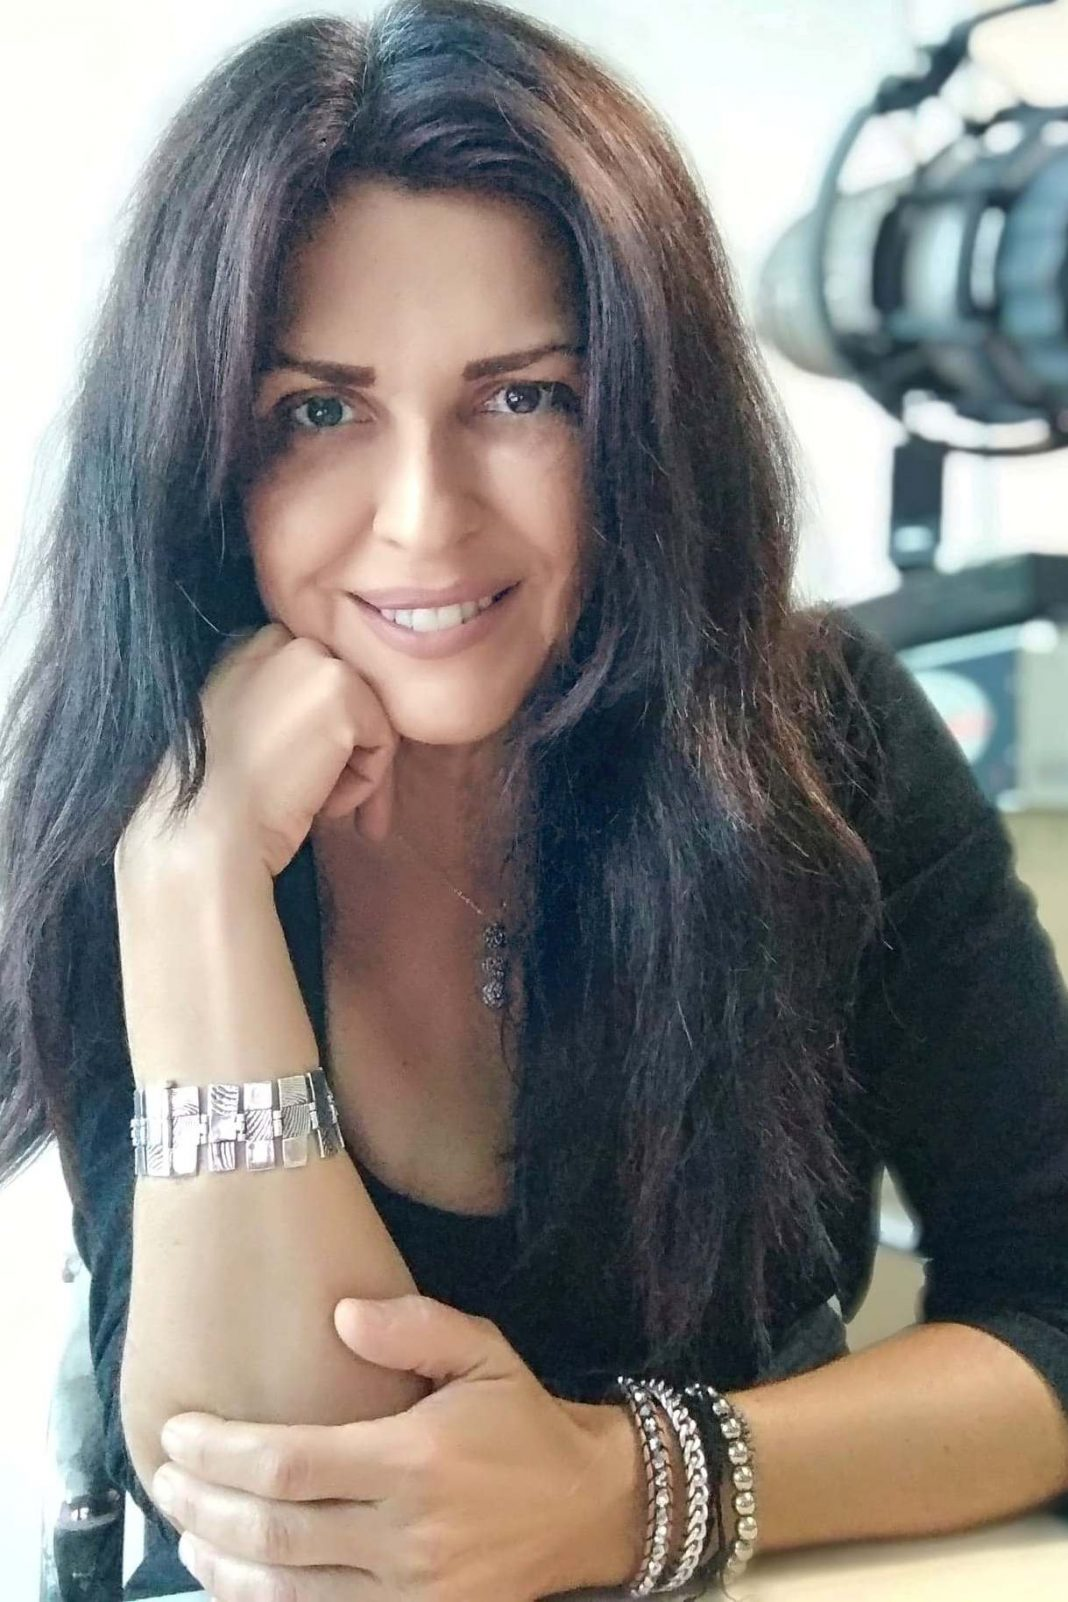 Dimash's songs broadcast on the Greek radio station